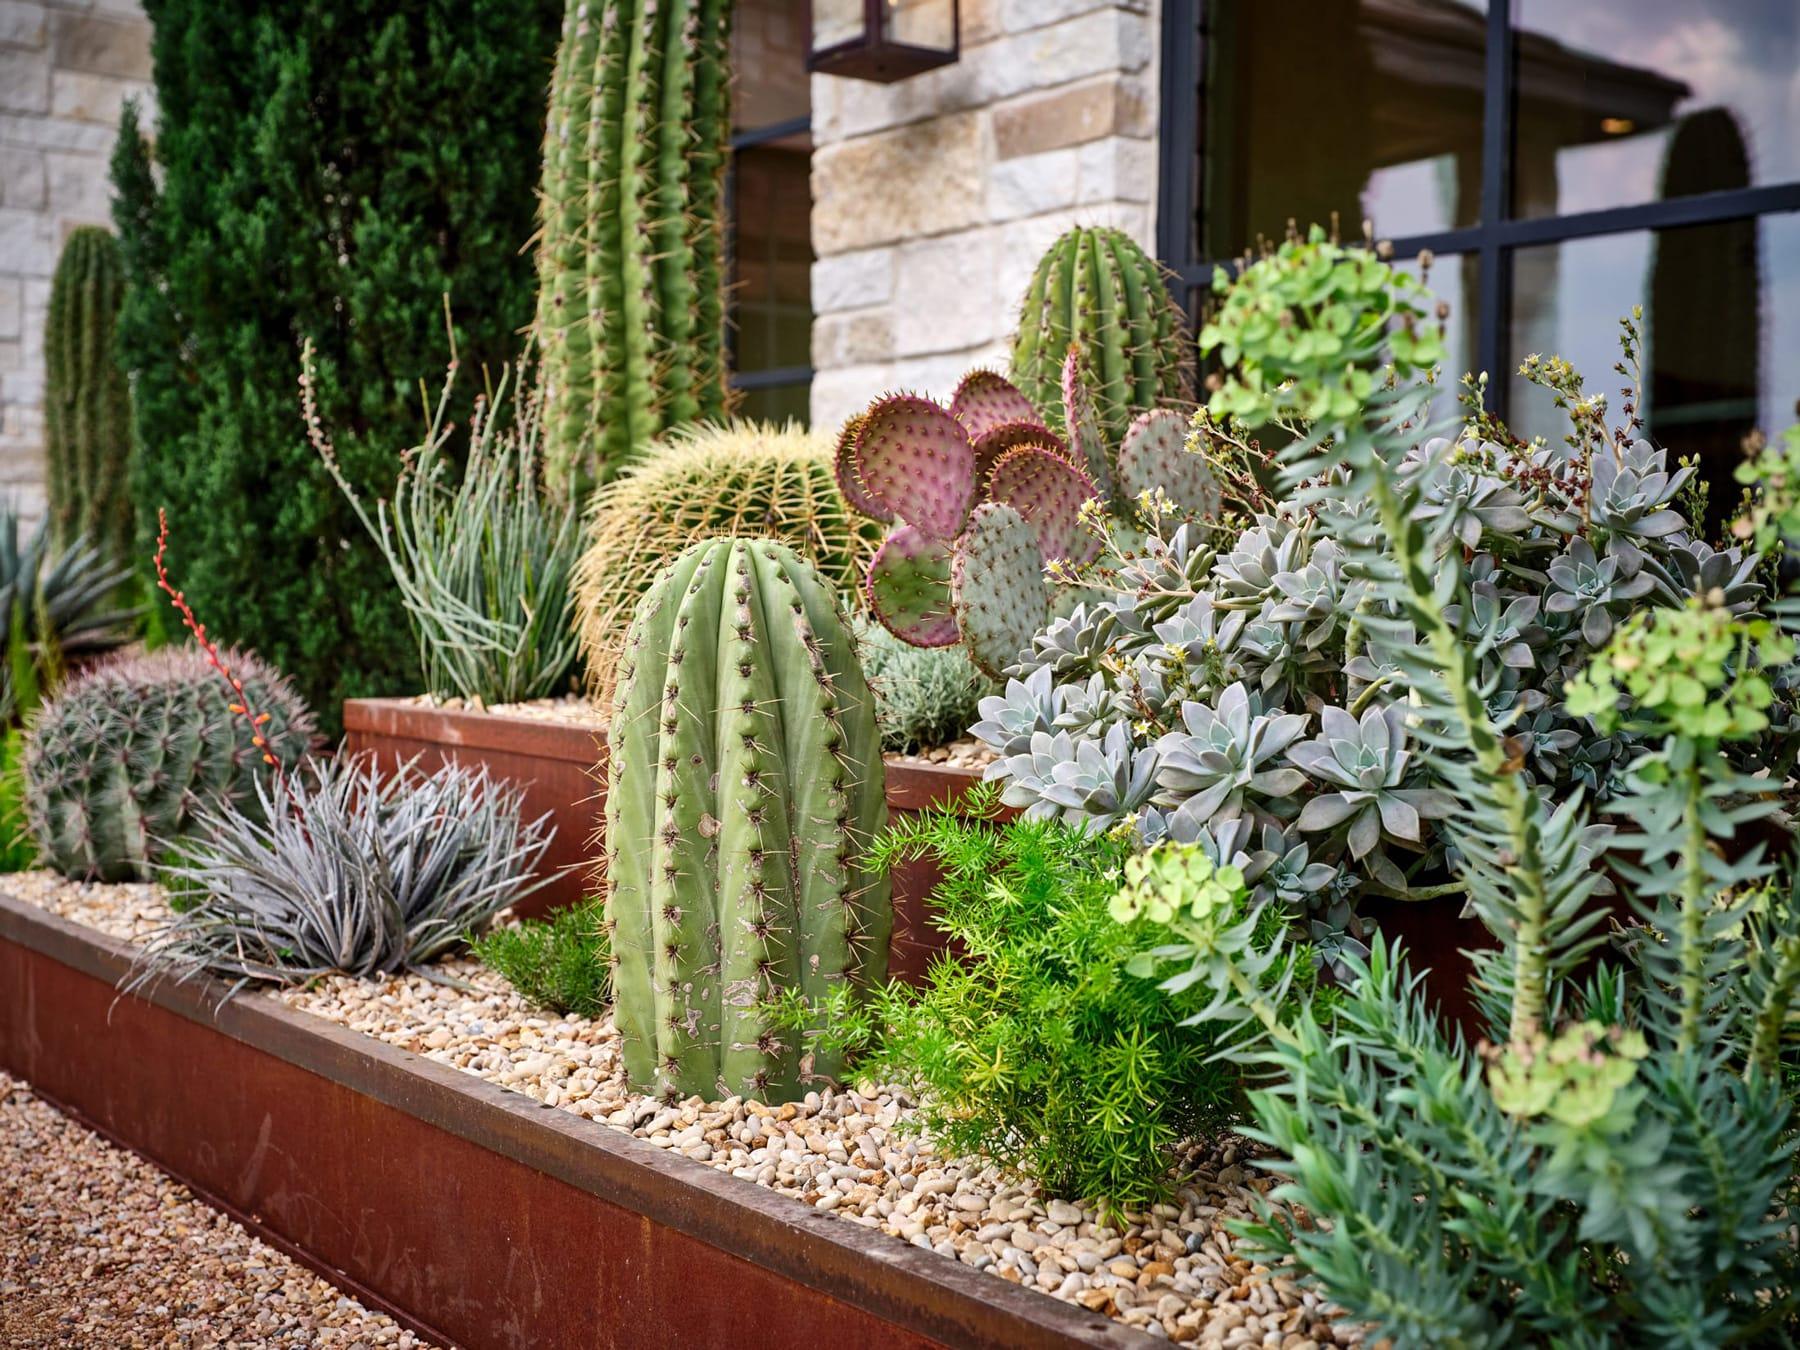 Blanton Residence sustainable landscape design in Gruene, TX by LUSH GreenScape Design